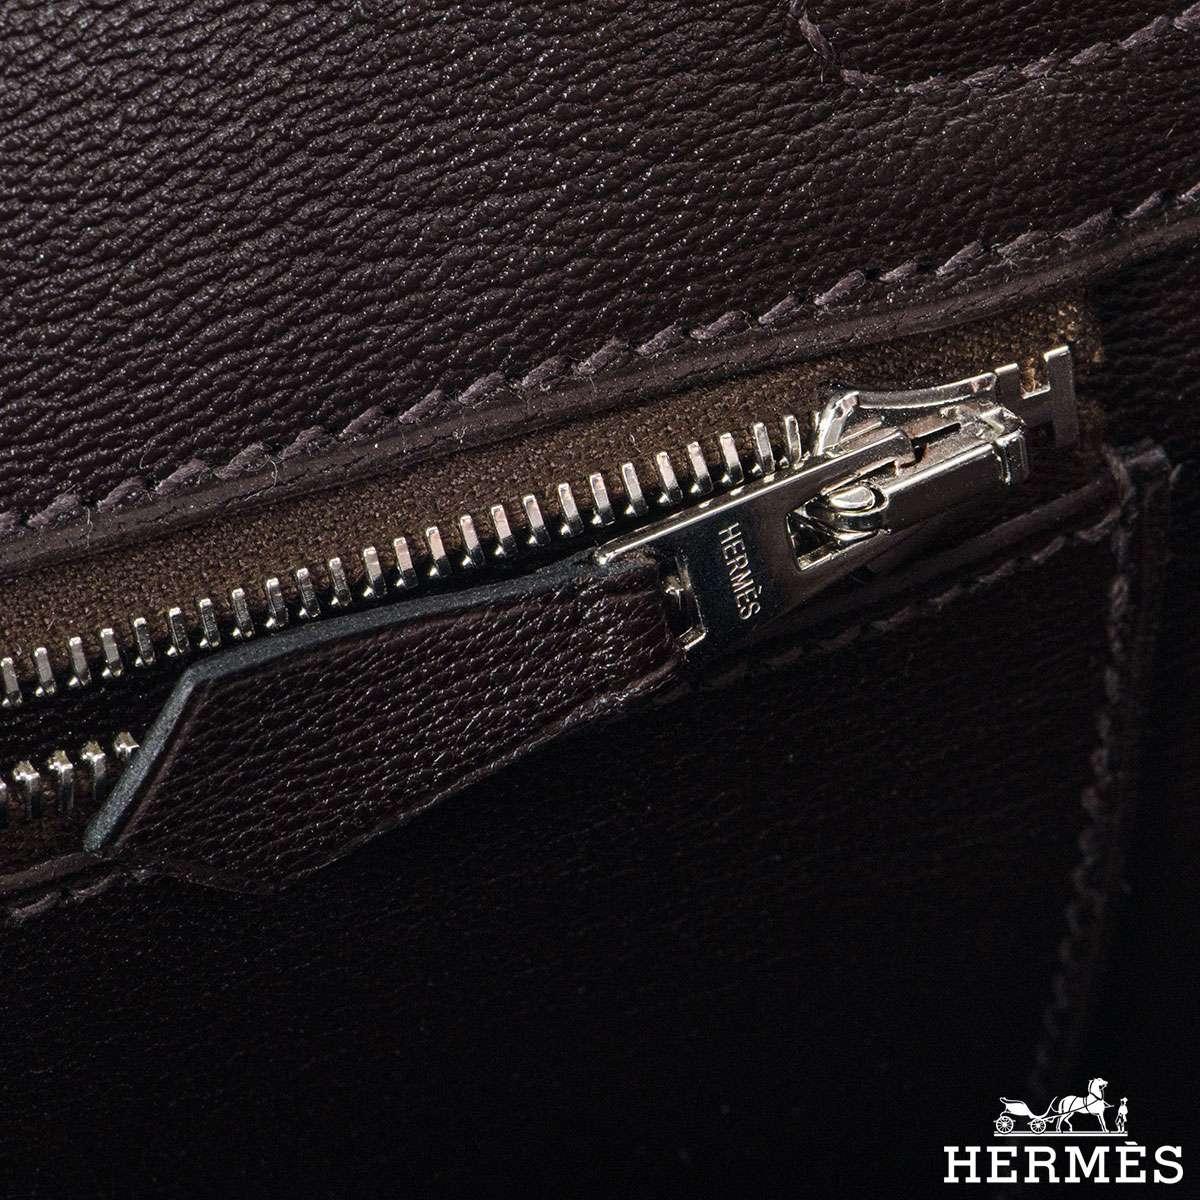 Hermès 25cm Cacoan Shiny Niloticus Crocodile Birkin Bag